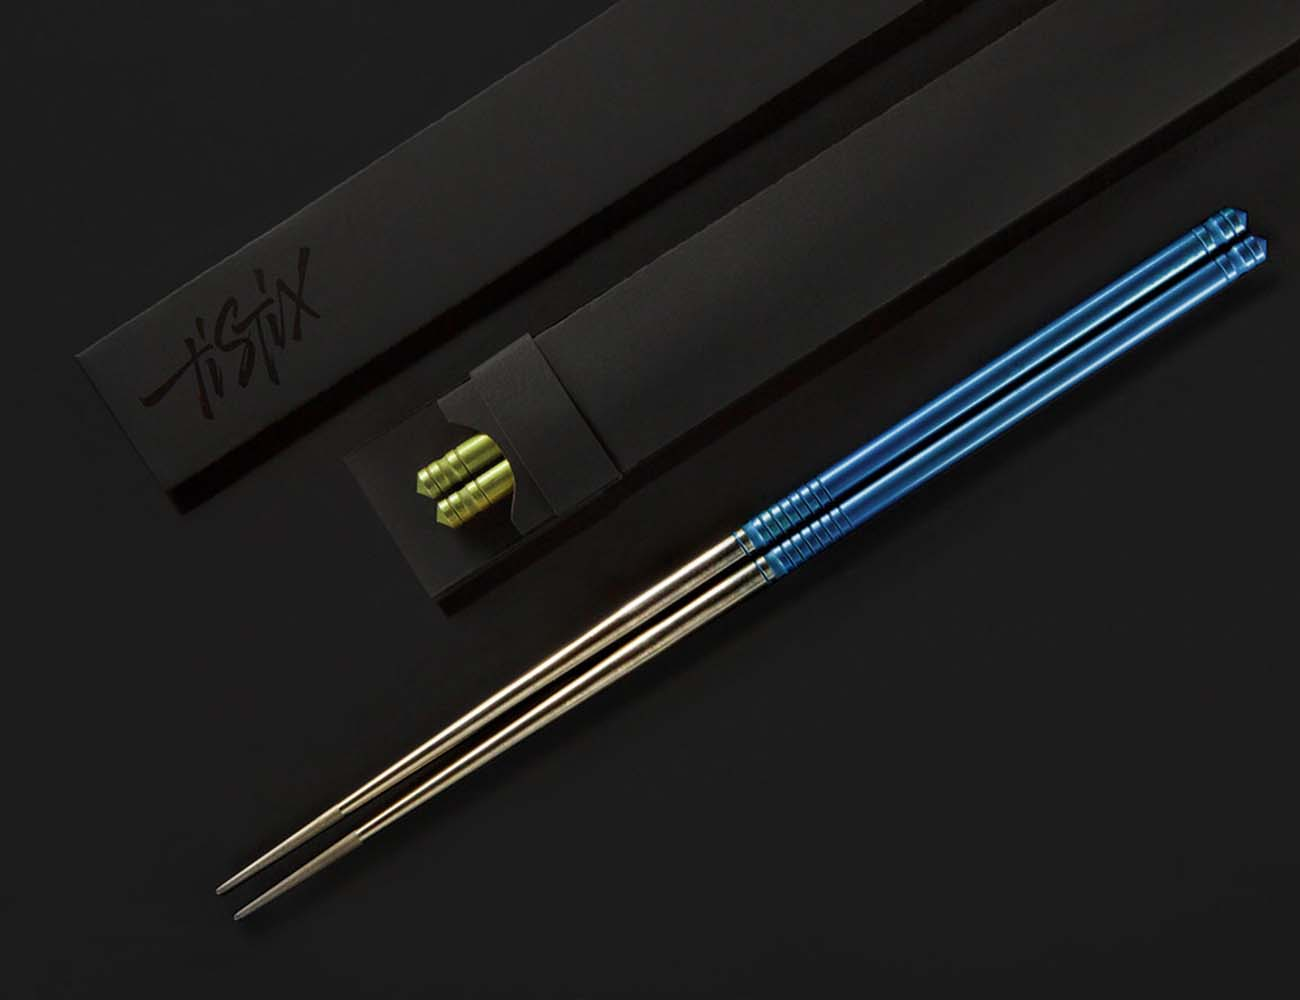 TiStix Titanium Chopsticks by Eatingtools